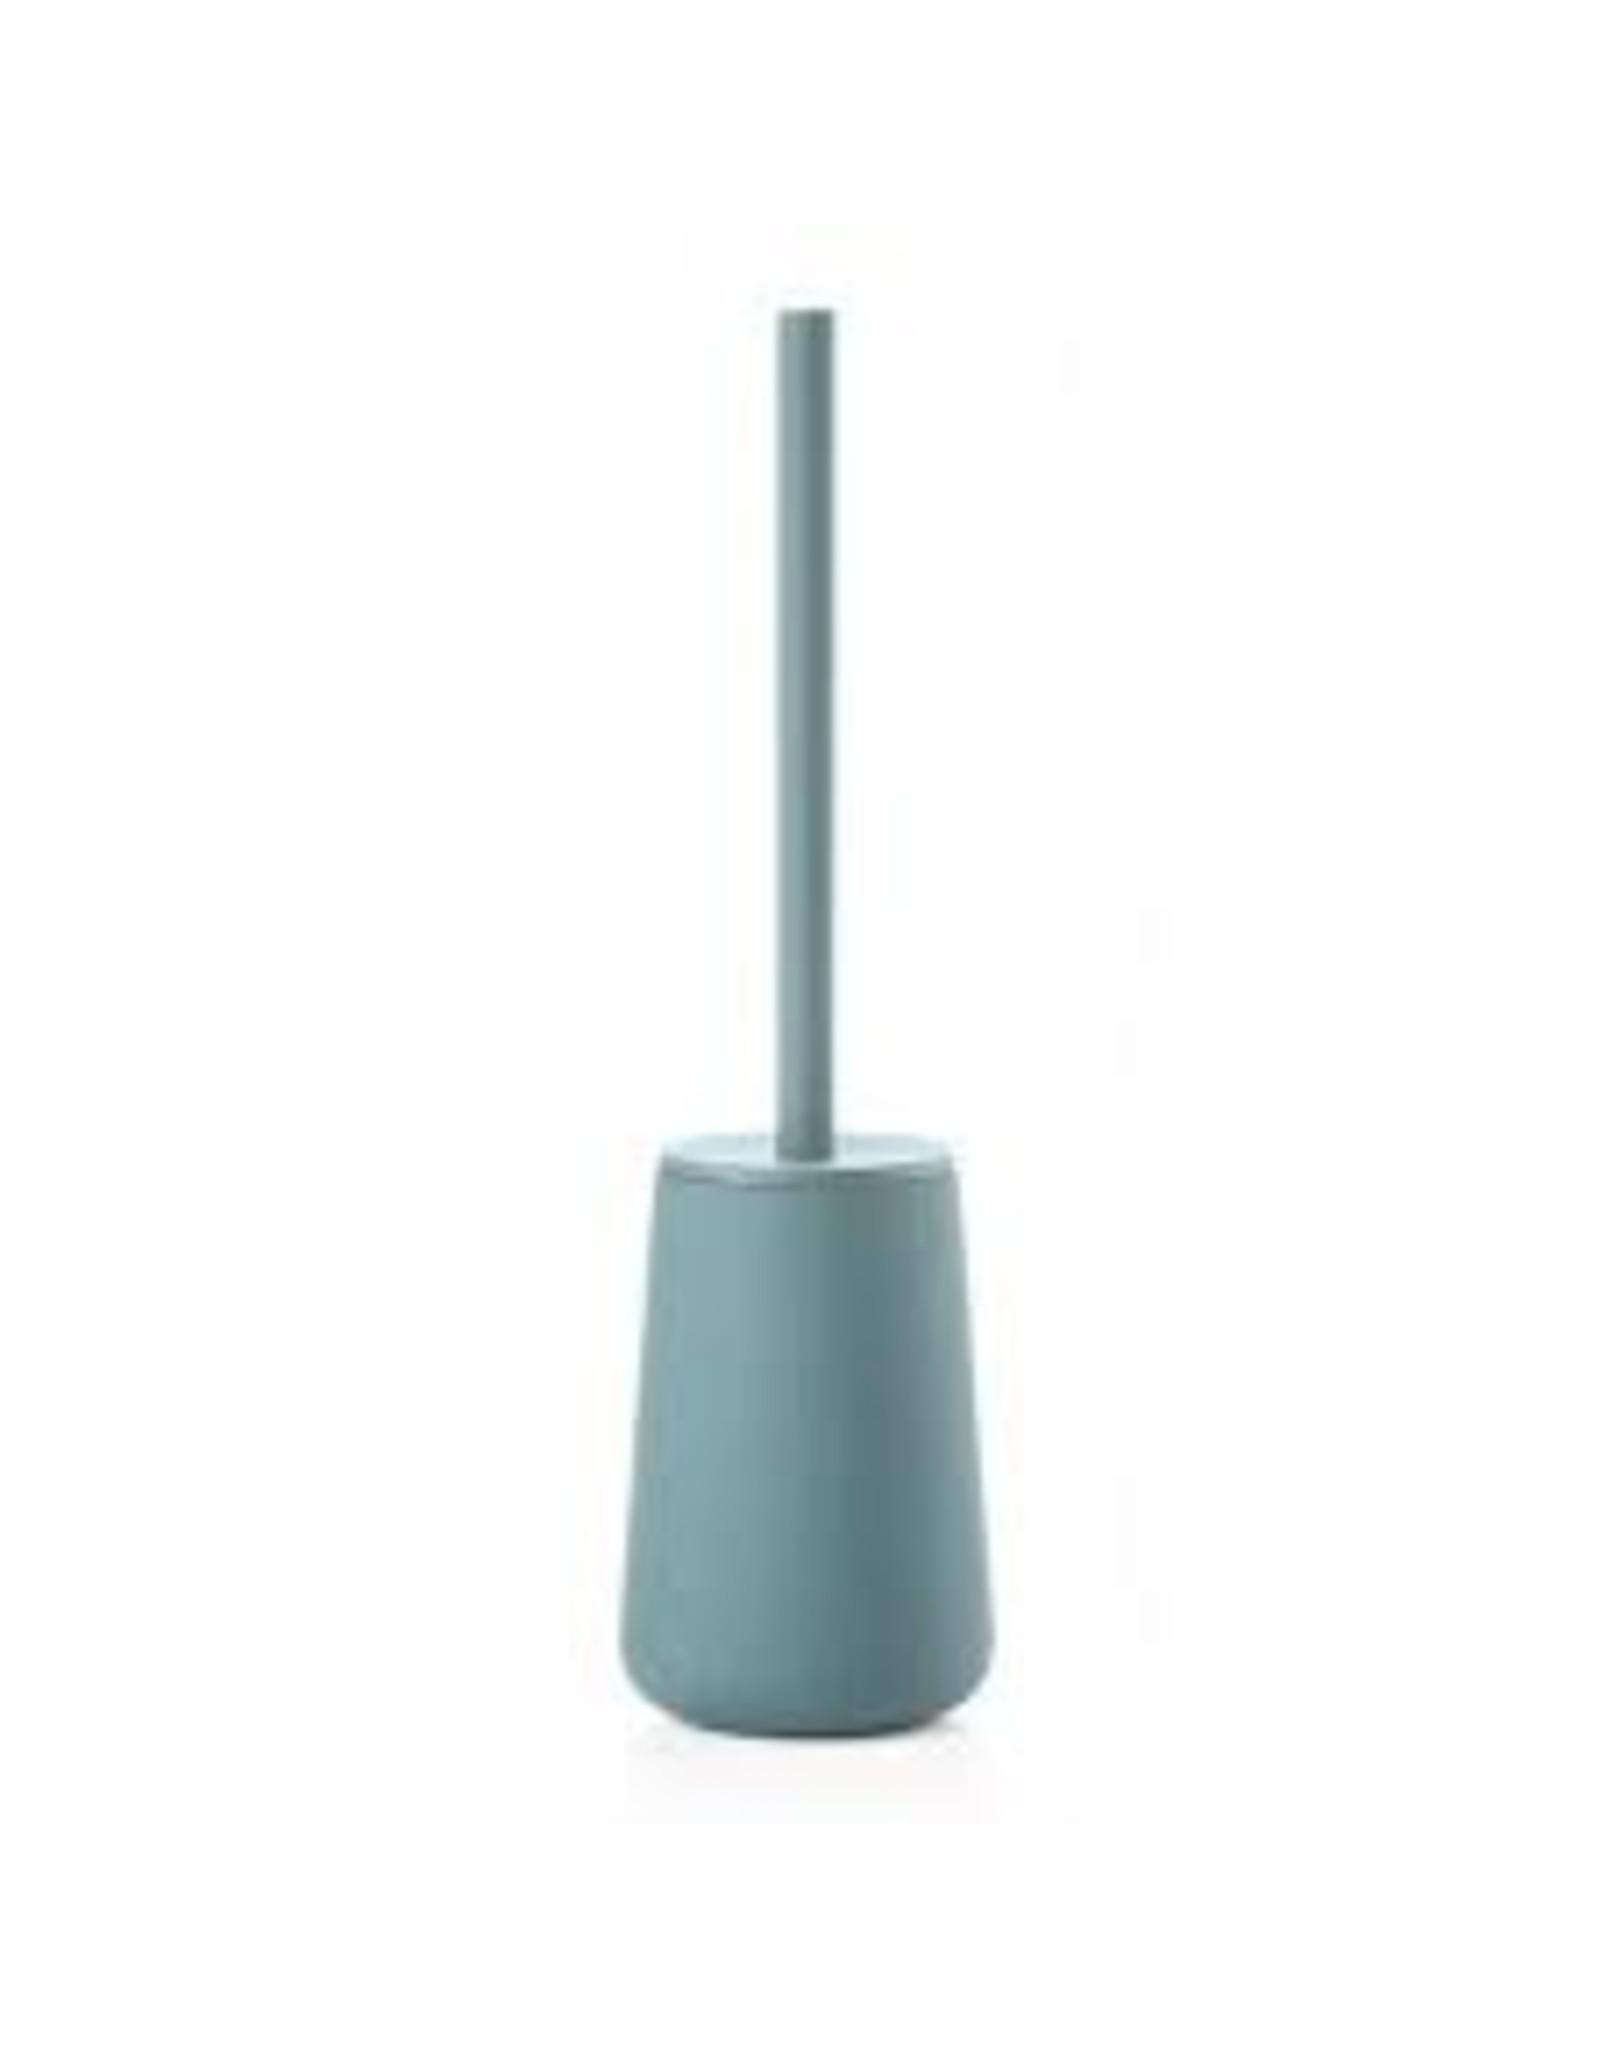 ZONE ZONE 332044 TOILETBORSTELHOUDER CAMEO BLUE